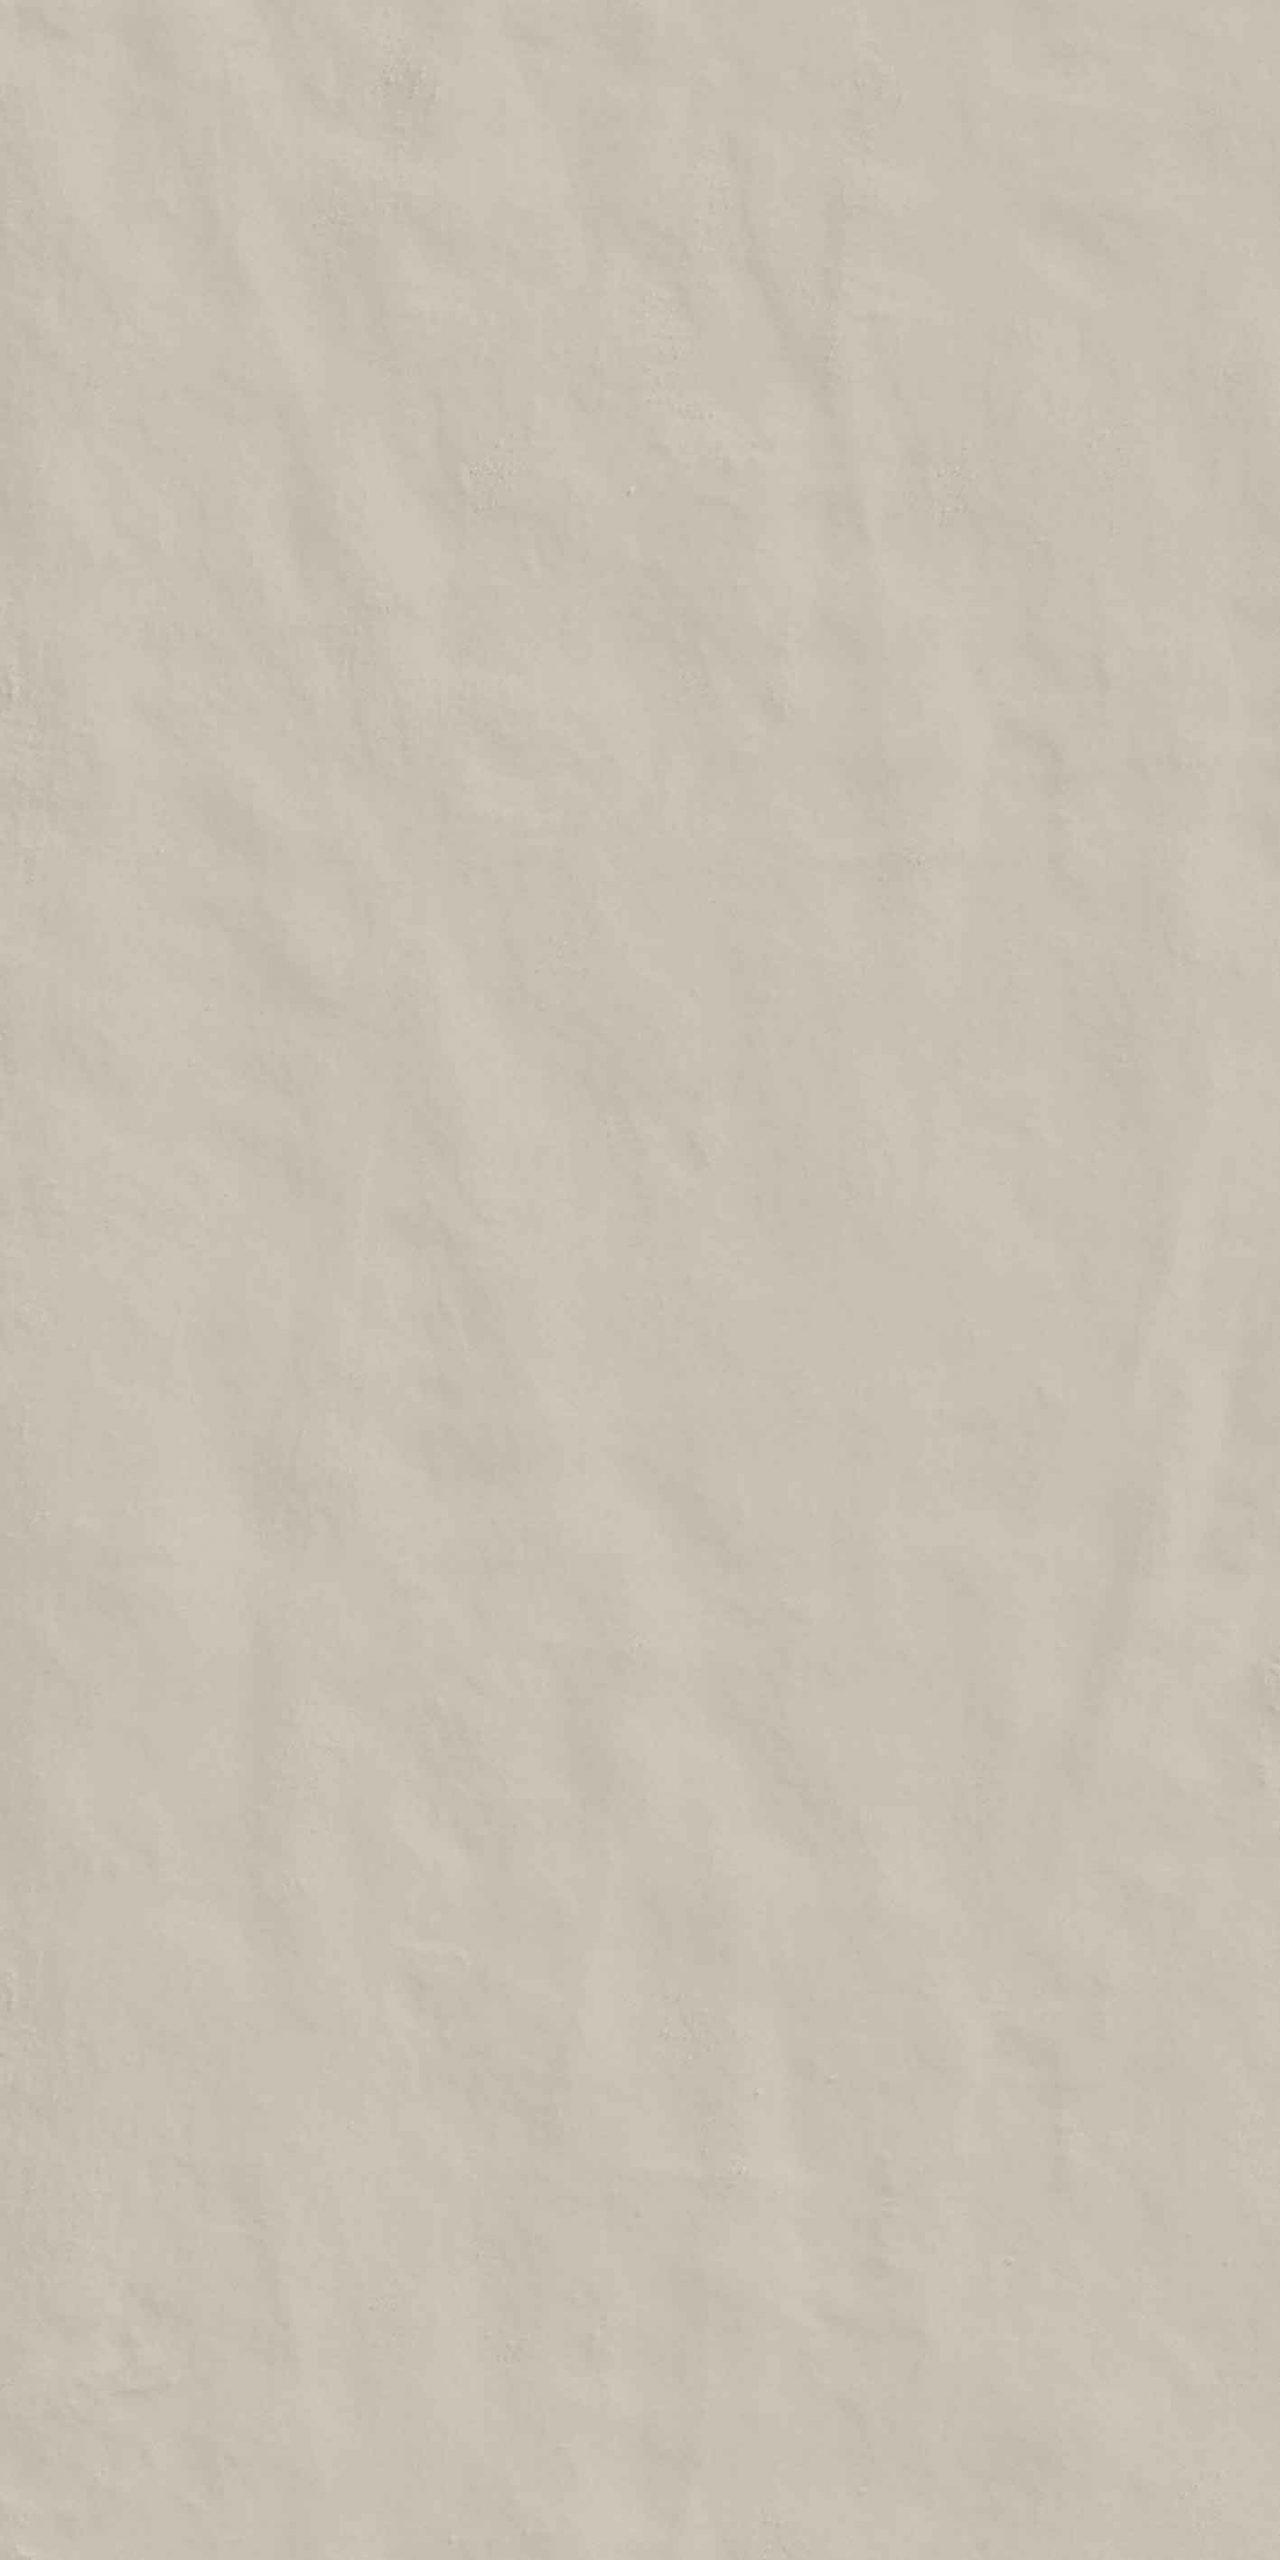 Neutra 6.0 Perla 03 Matte 10mm 60 x 120